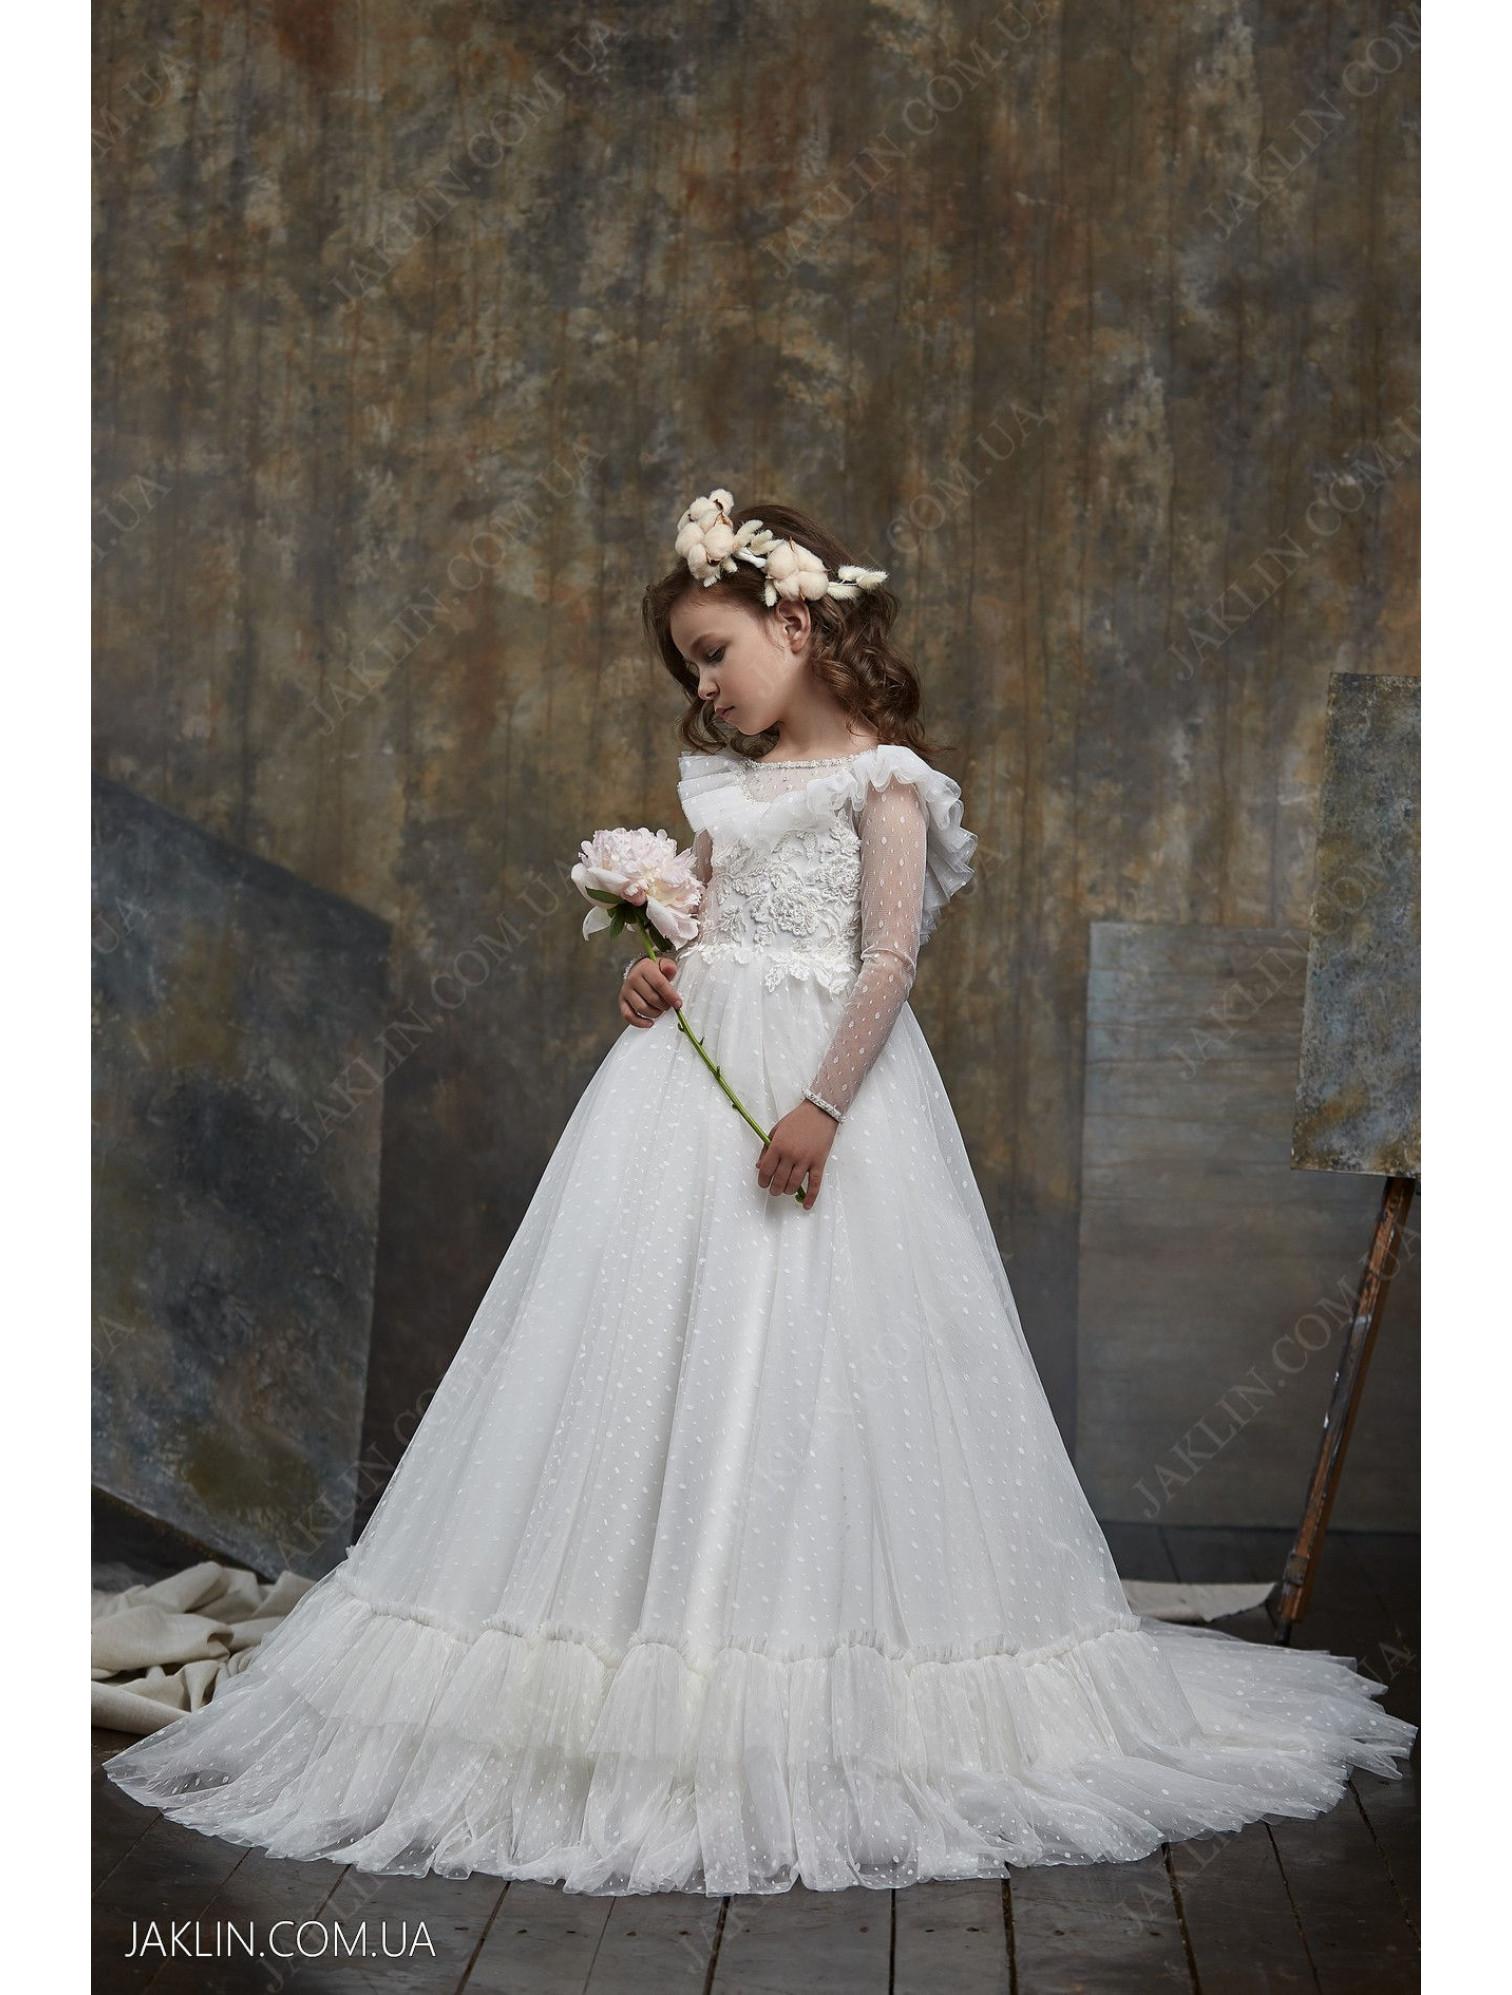 Child dress 3002